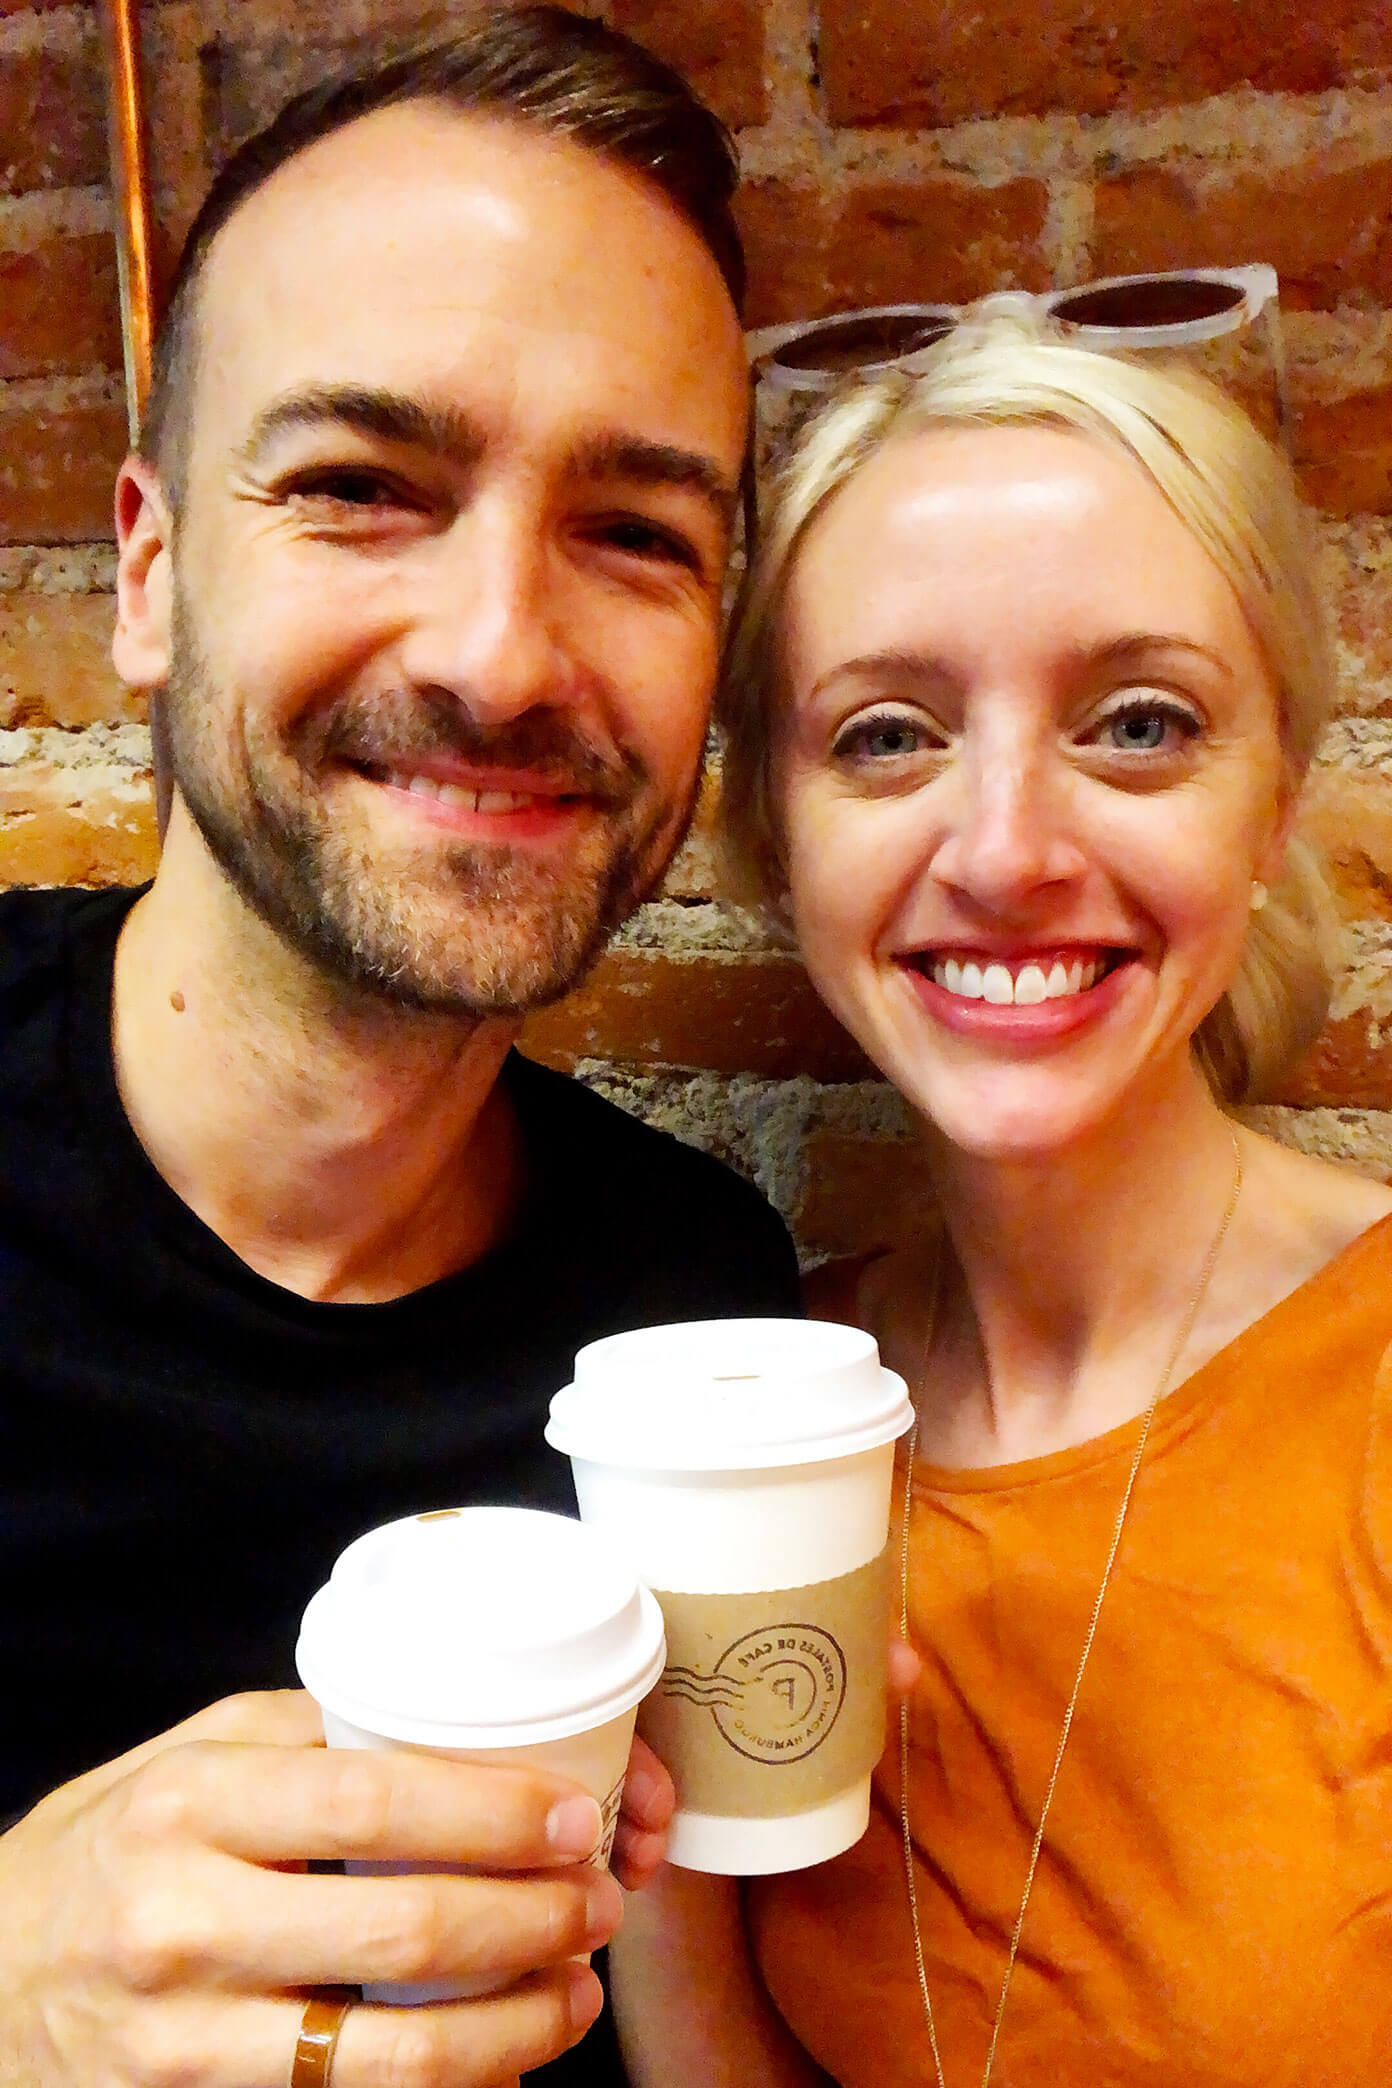 Postales de Cafe in Mexico City | Barclay and Ali Martin